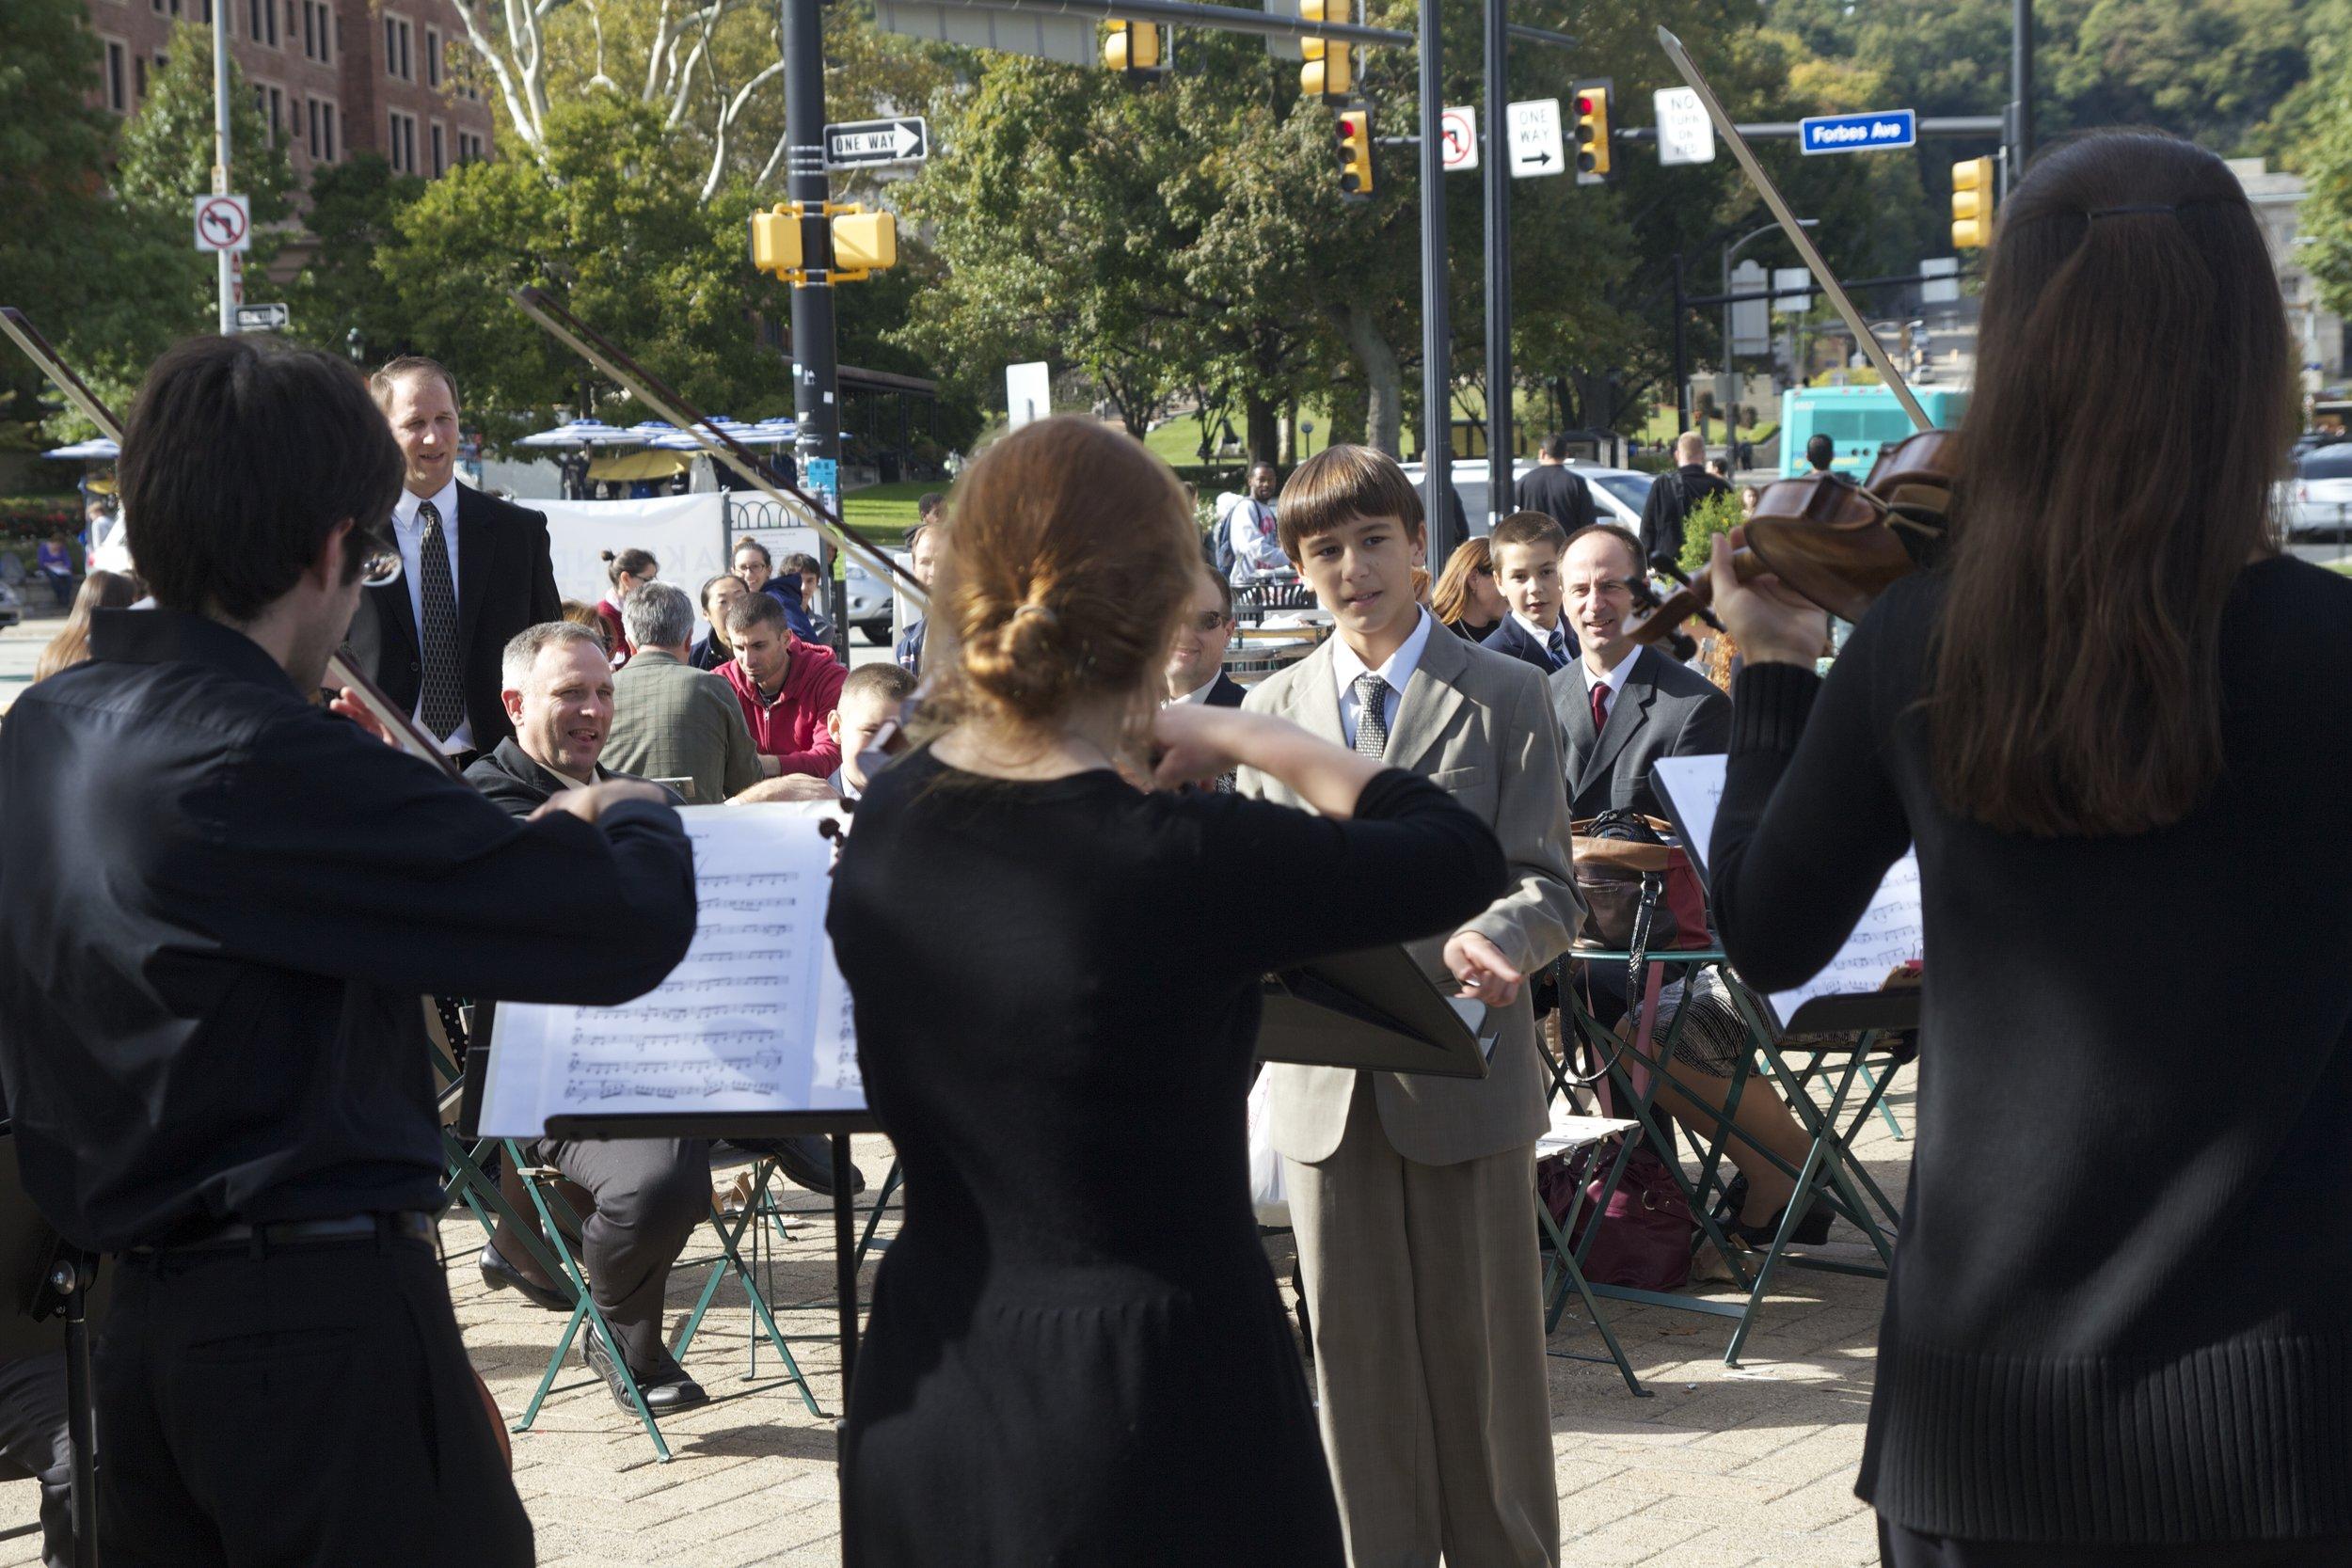 Conduct Us ensemble in Schenley Plaza